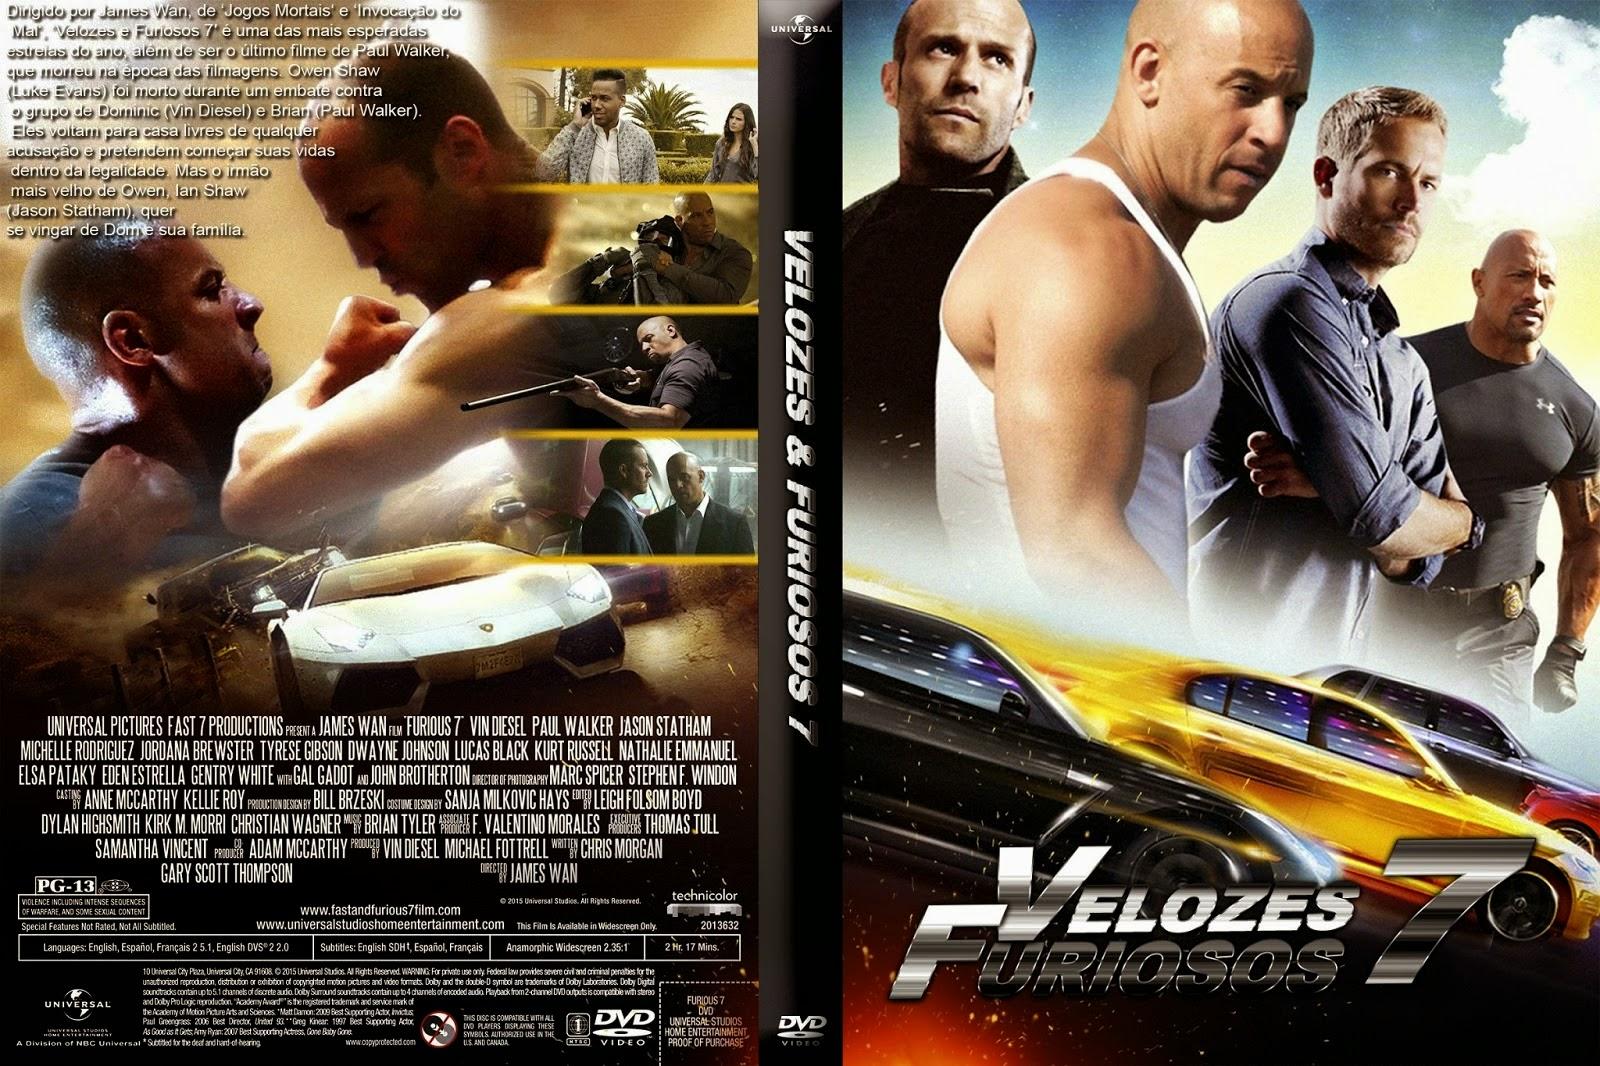 Baixar Velozes e Furiosos 7 DVDRip XviD Dual Áudio Velozes 2BE 2BFuriosos 2B7 2B01